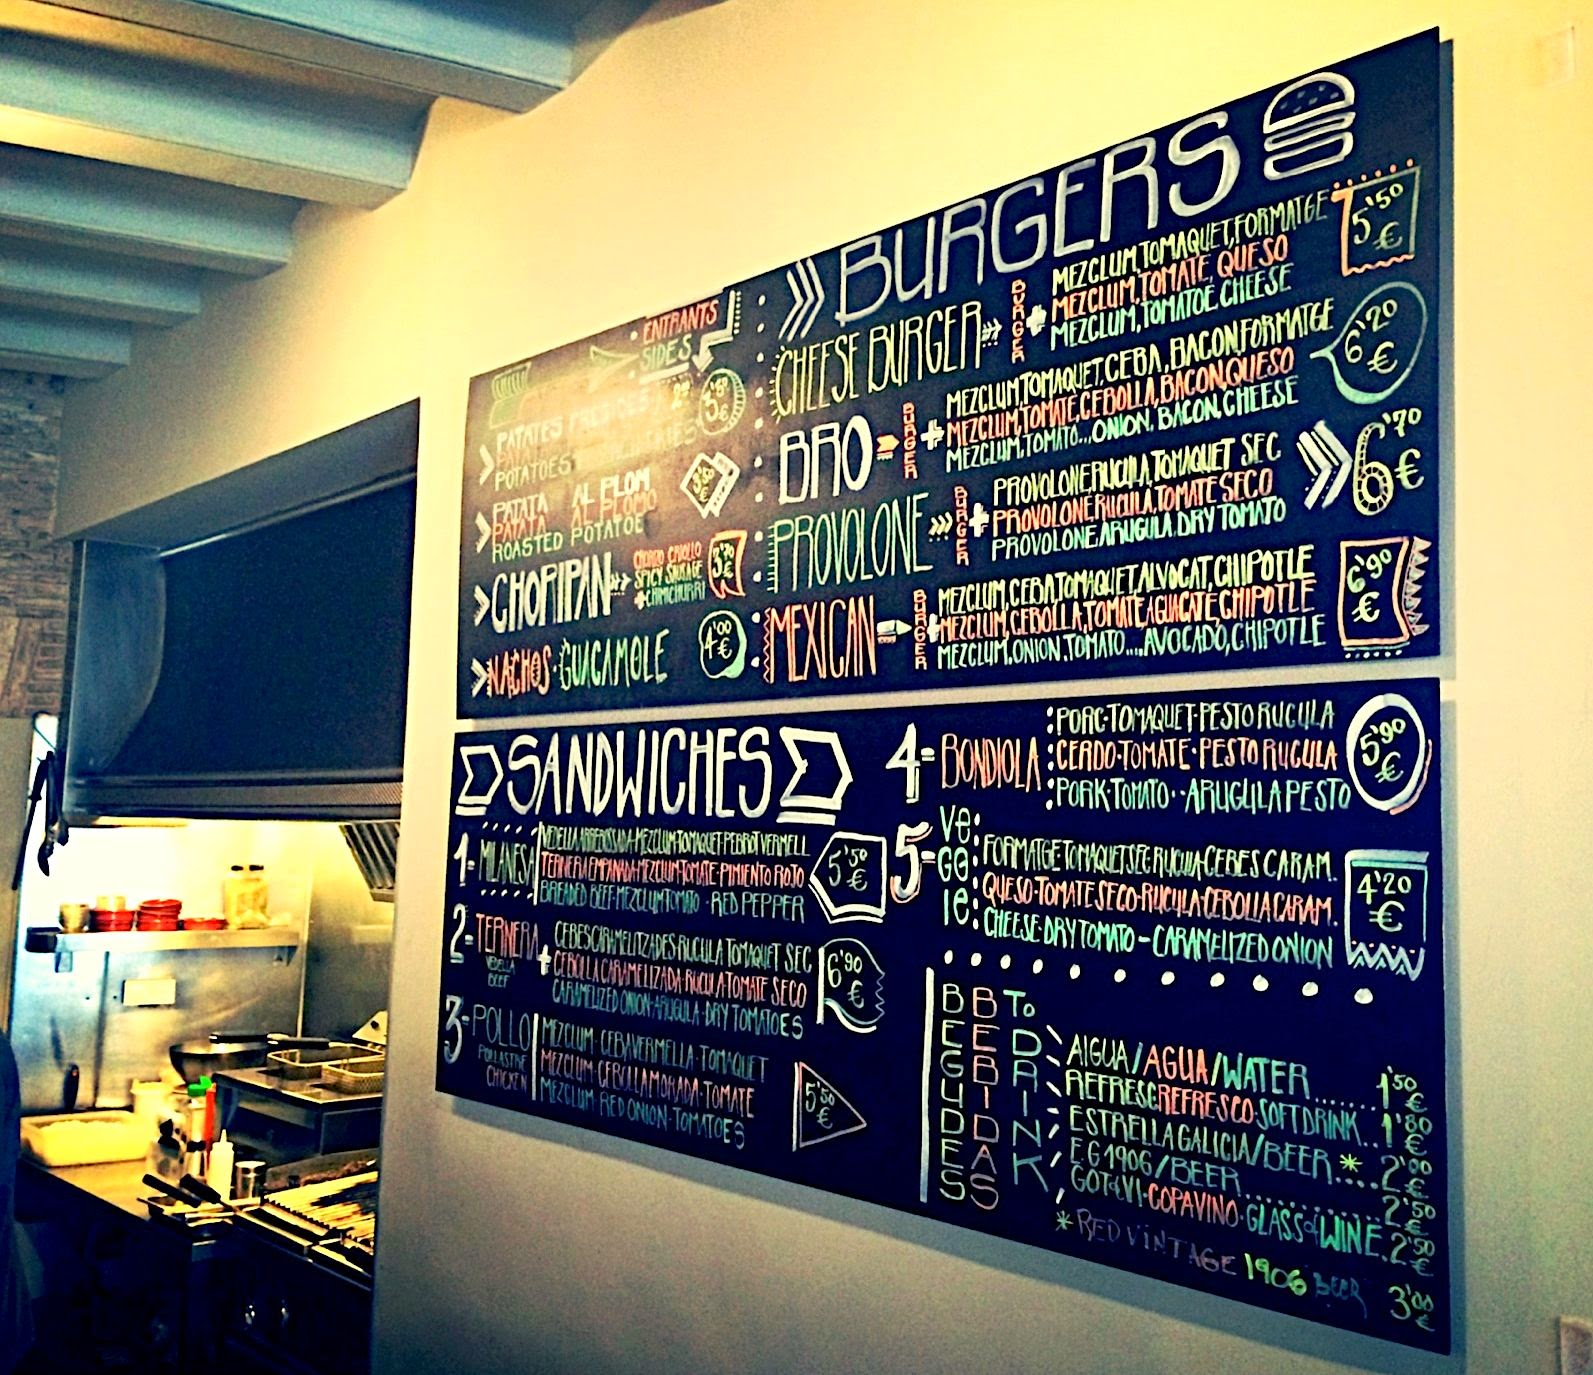 BRO Barcelona Grilled&Bread